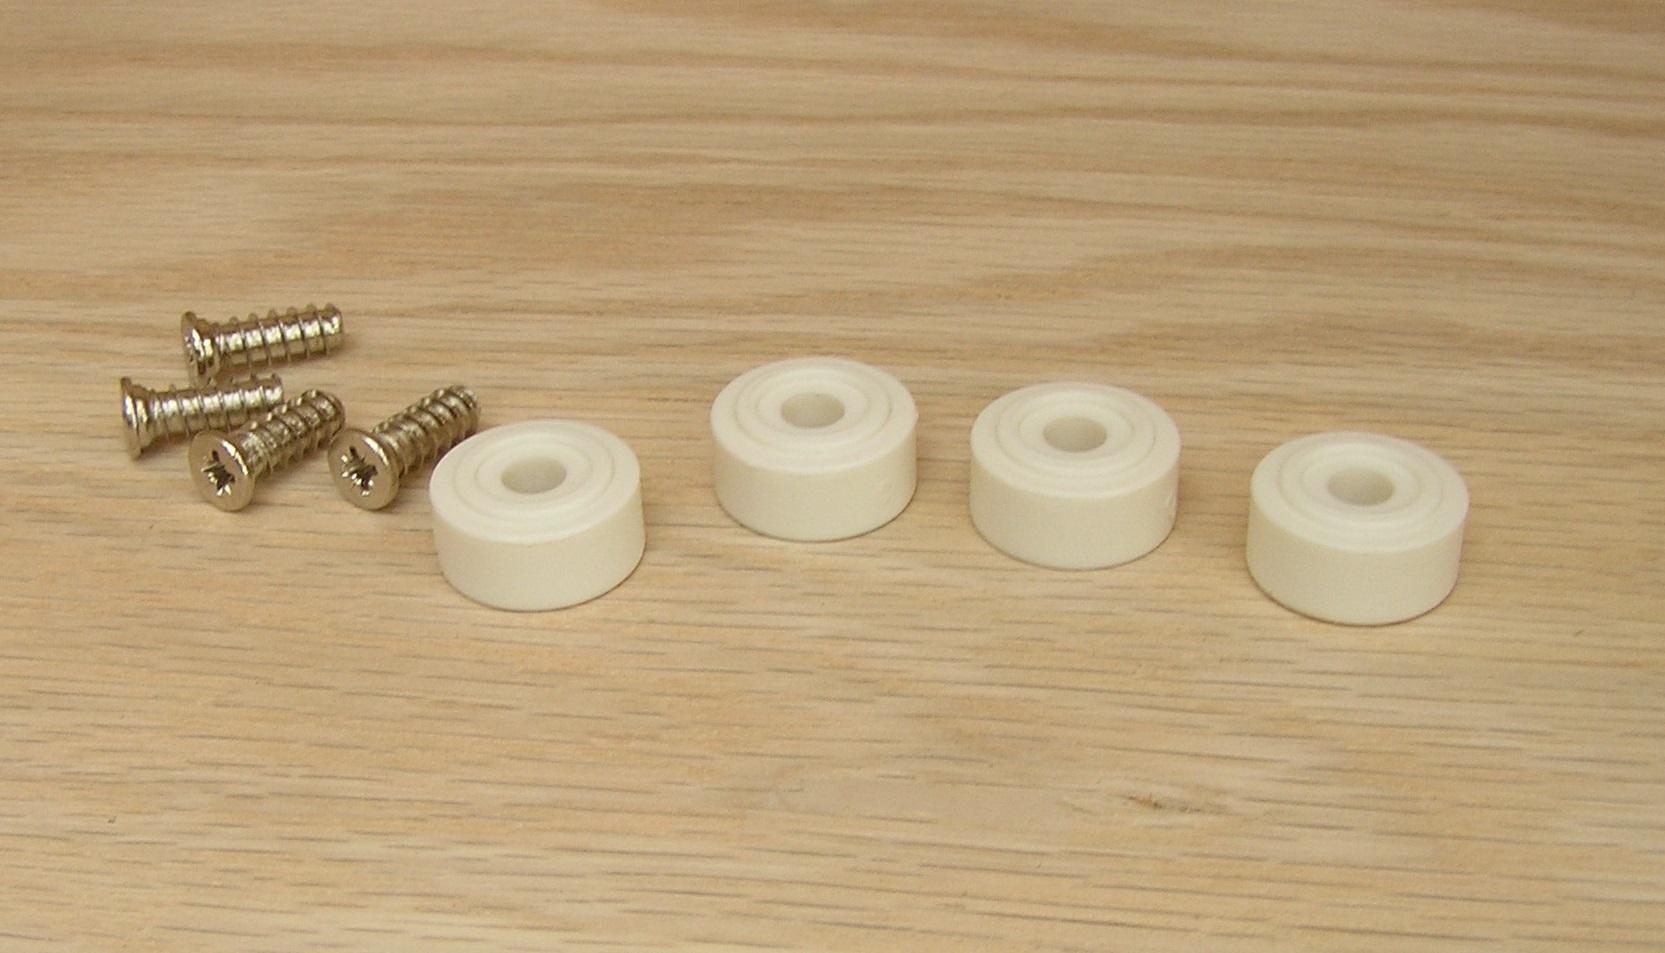 standoff-long-euro-screws.jpg